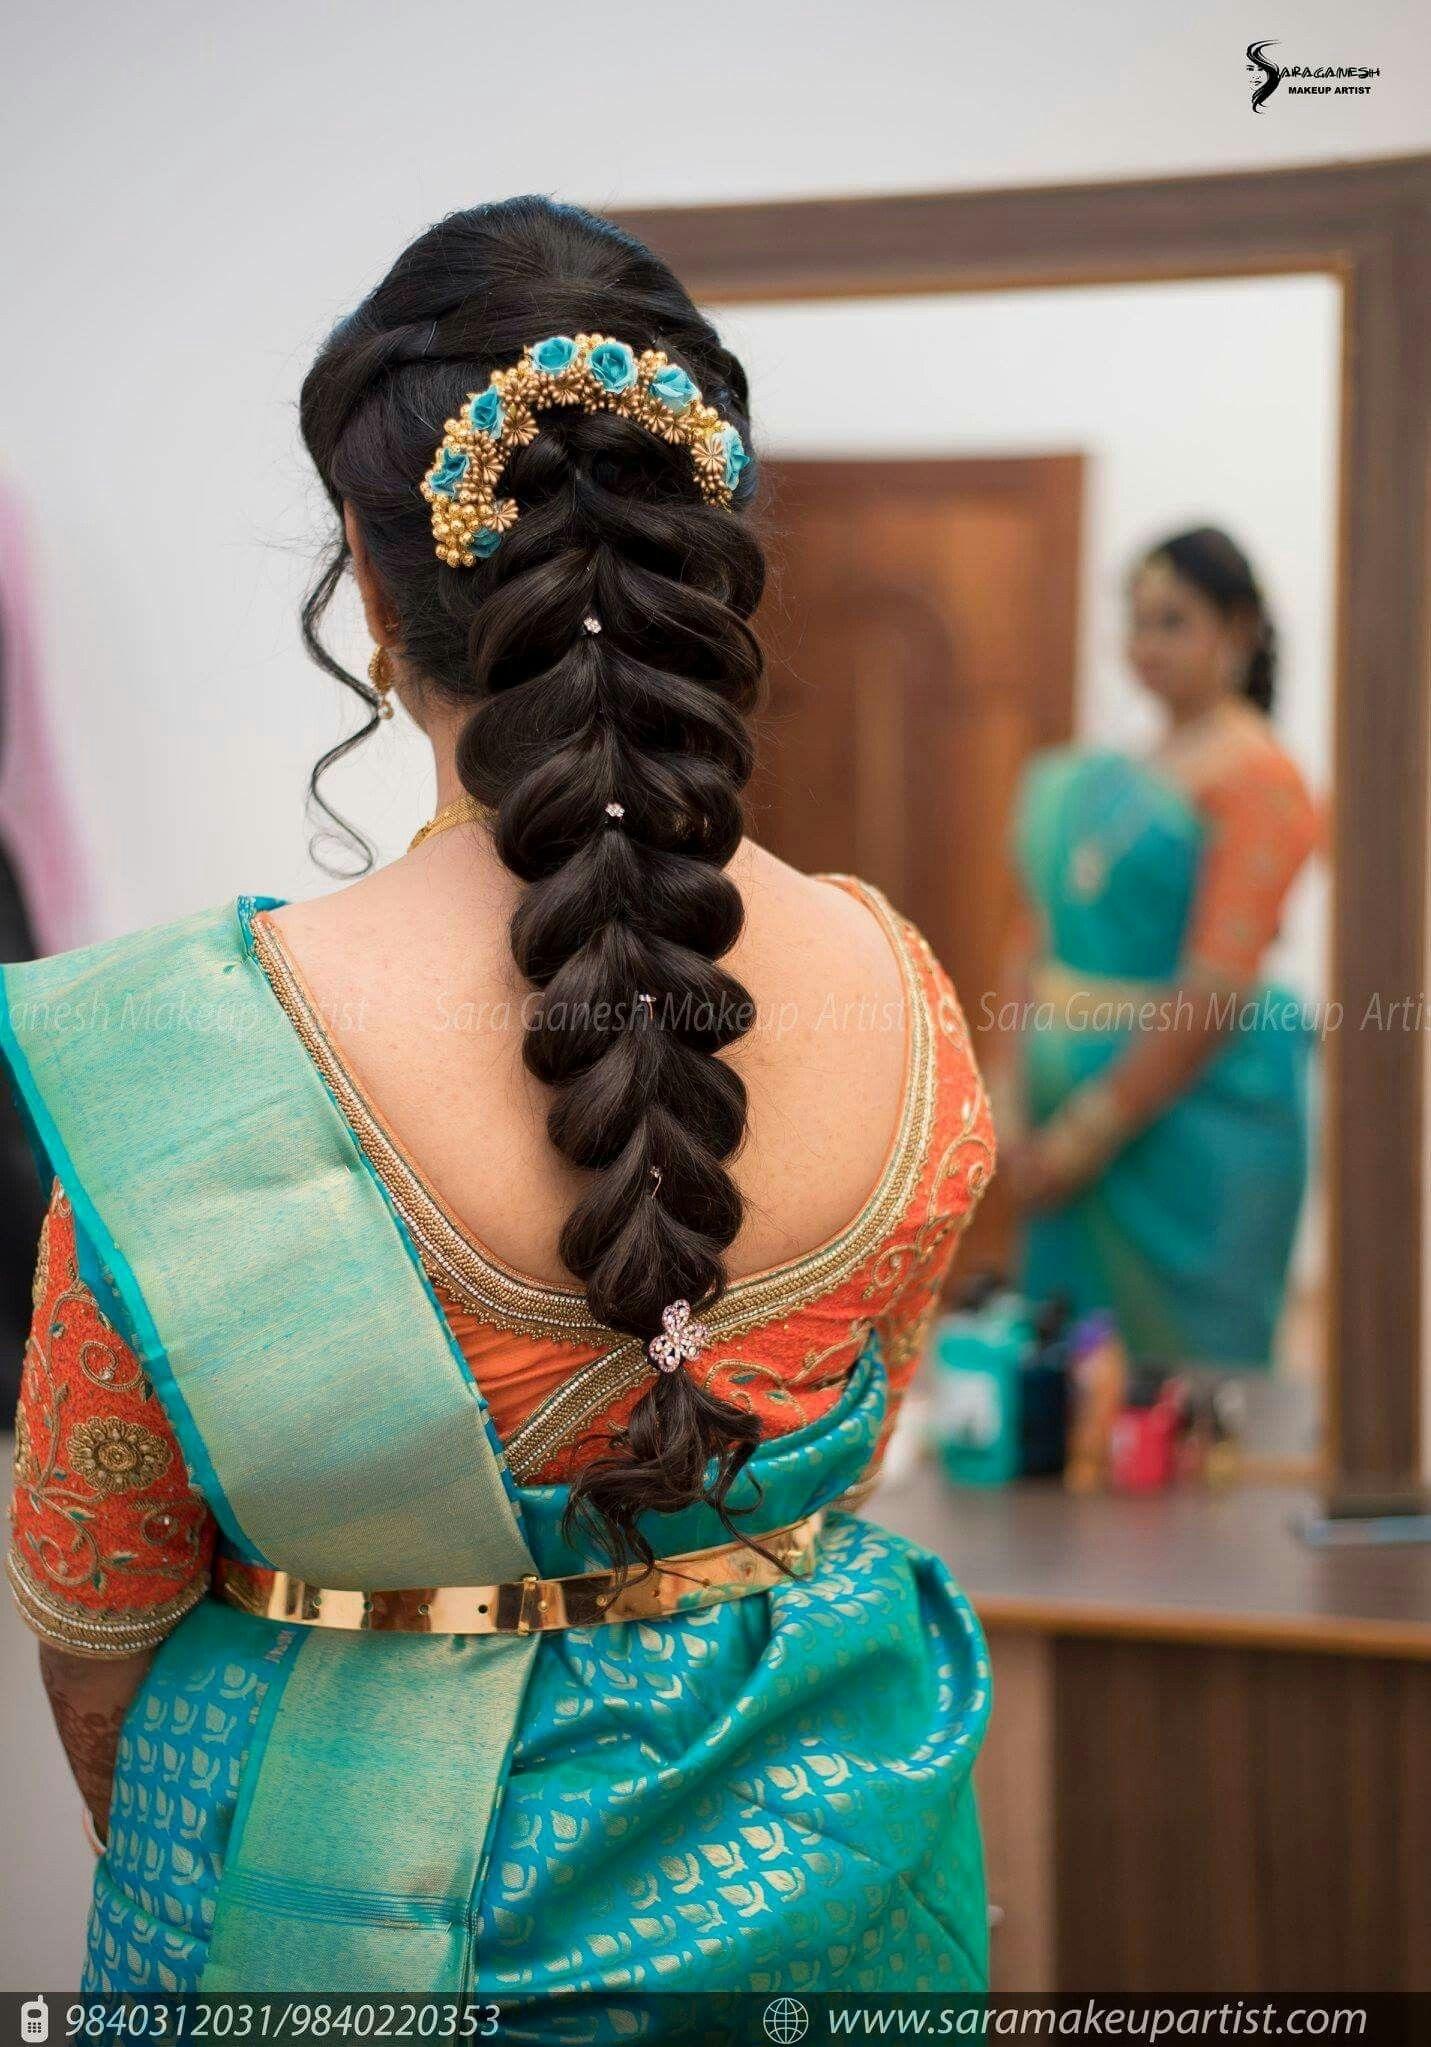 Hair Do | Hair Do | Indian Wedding Hairstyles, Wedding regarding South Indian Hairstyles For Long Hair For Wedding